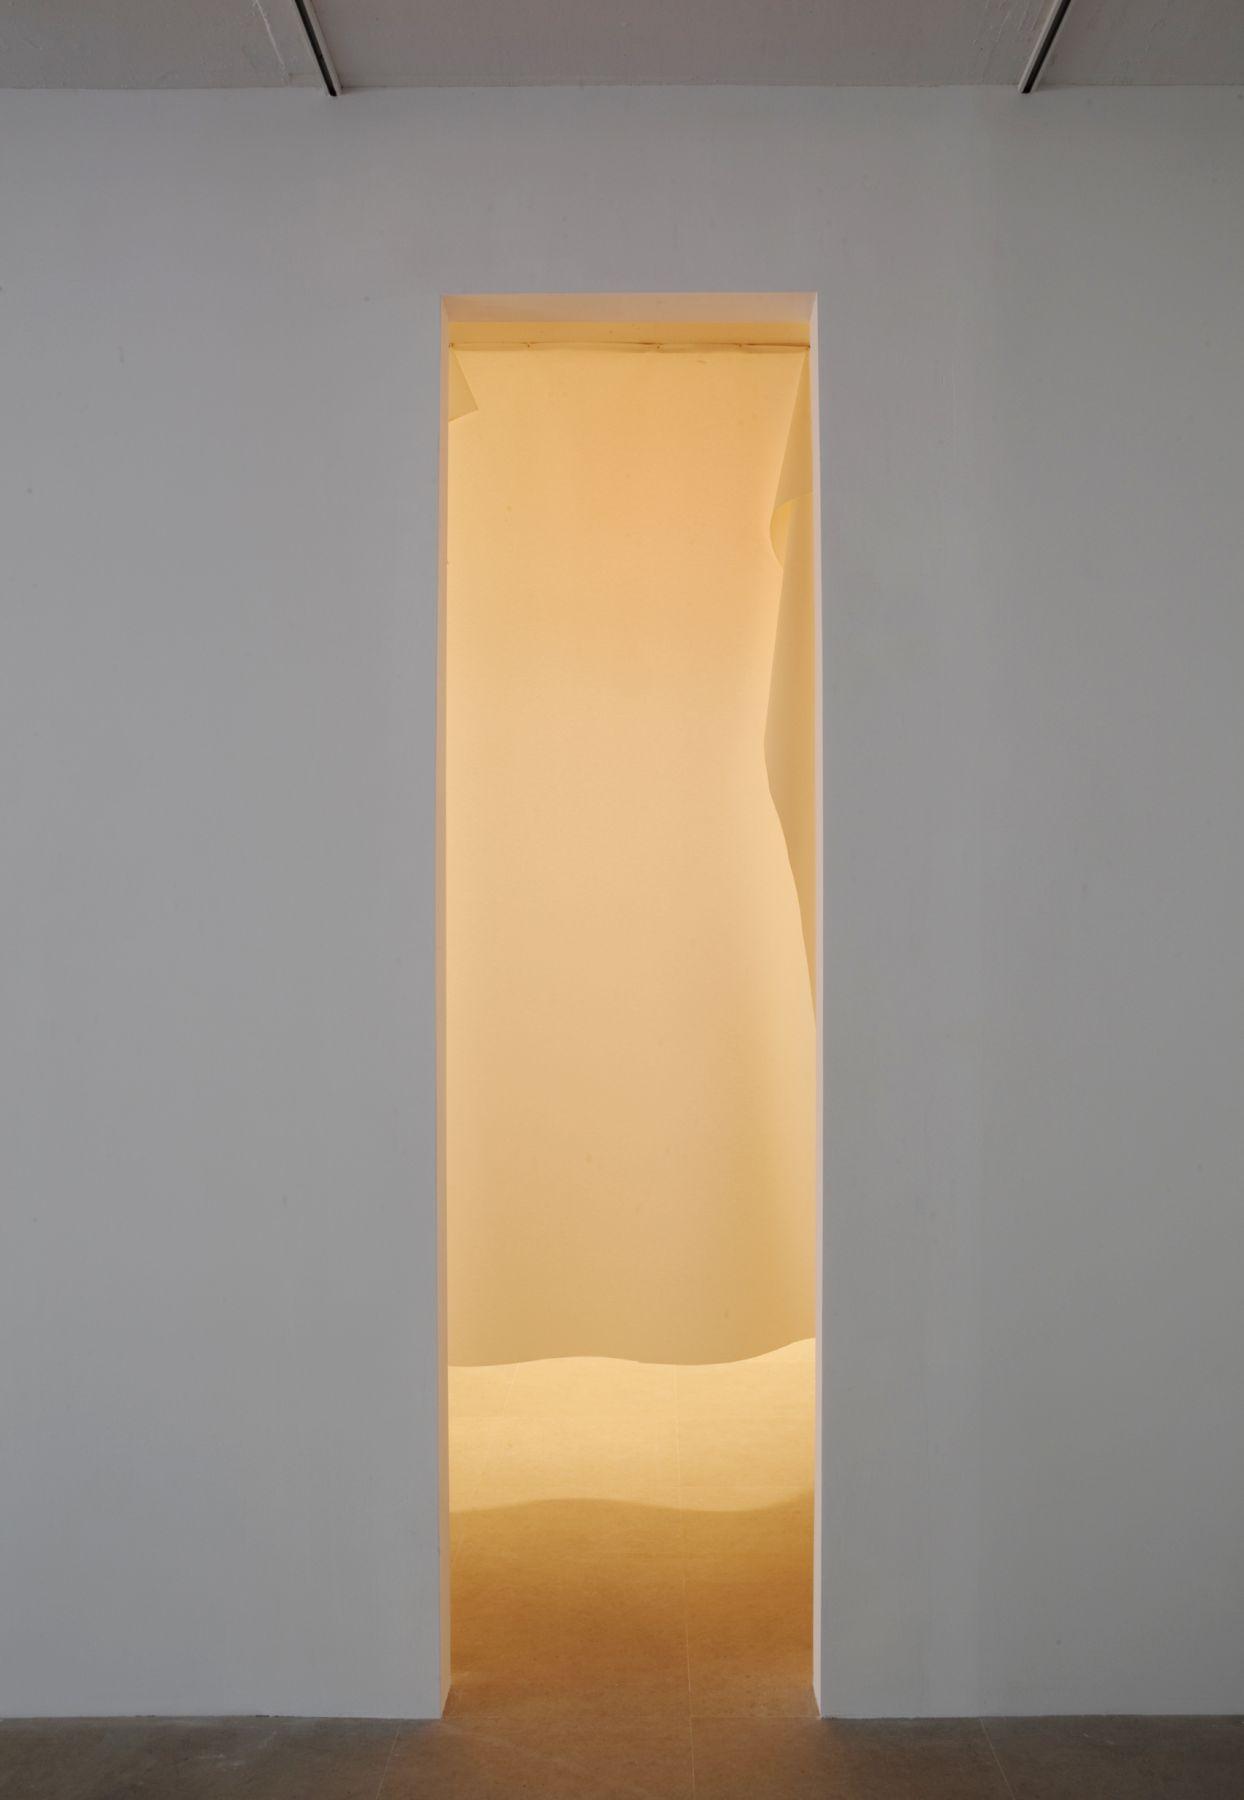 Gedi Sibony The Brighter Grows the Lantern, 2010 Vinyl, nails, light, room 137 x 313 x 133 1/2 inches (348 x 795 x 339 cm)